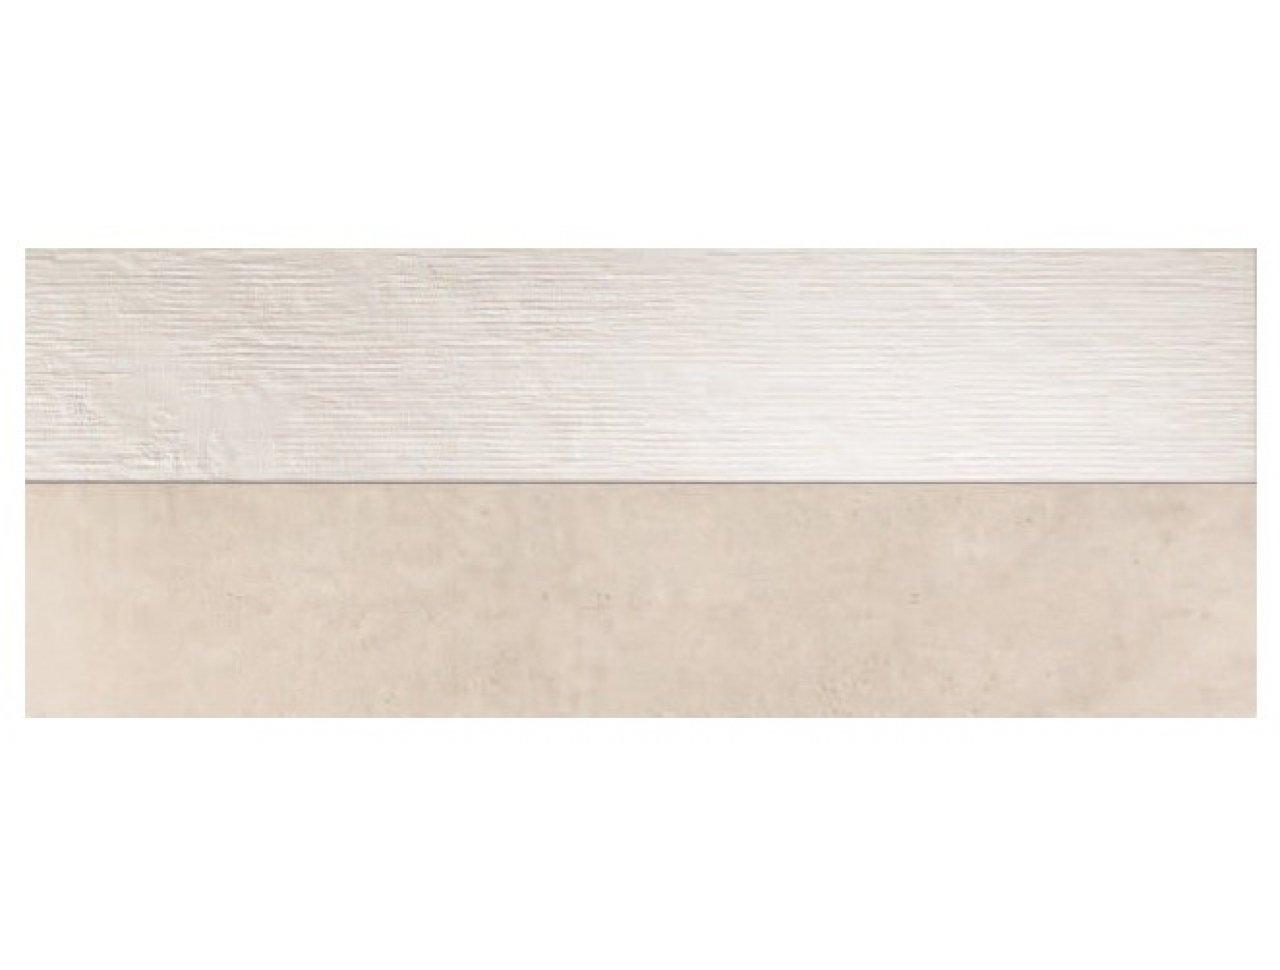 Керамическая плитка PORCELANOSA Twin Bottega Caliza 45x120